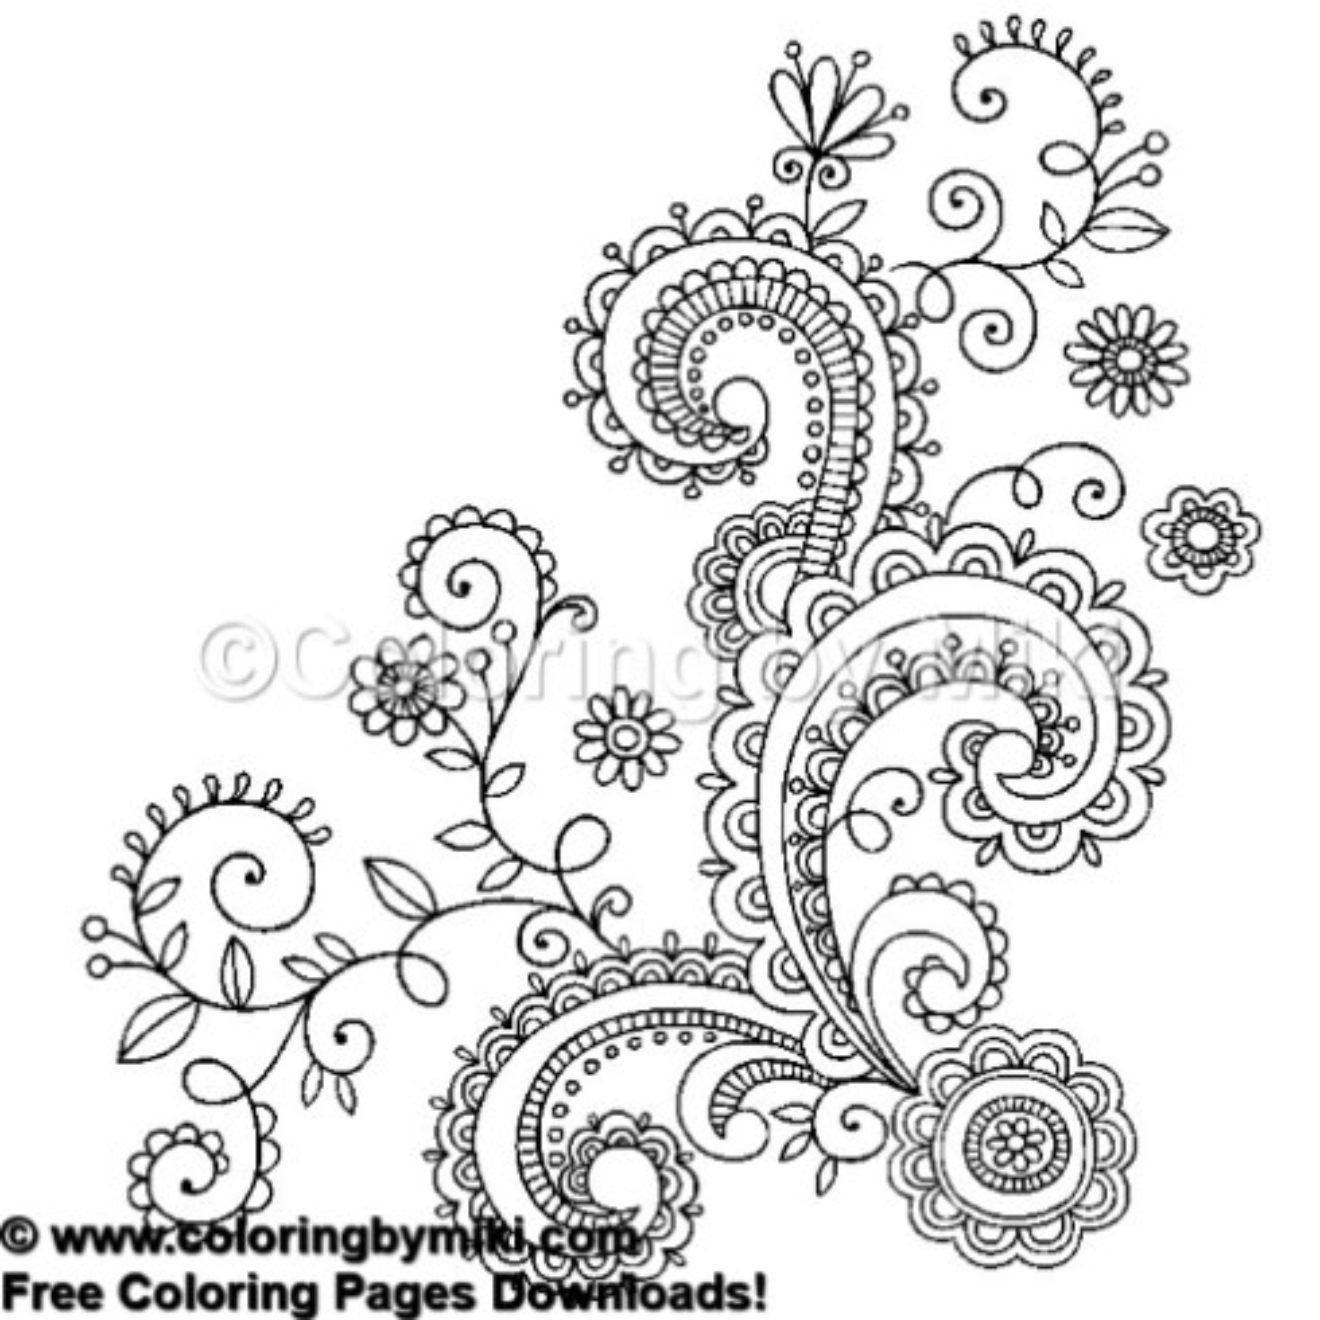 Henna Tattoo Design Coloring Page #653 | Boho / Tribal - Free - Free Printable Henna Tattoo Designs